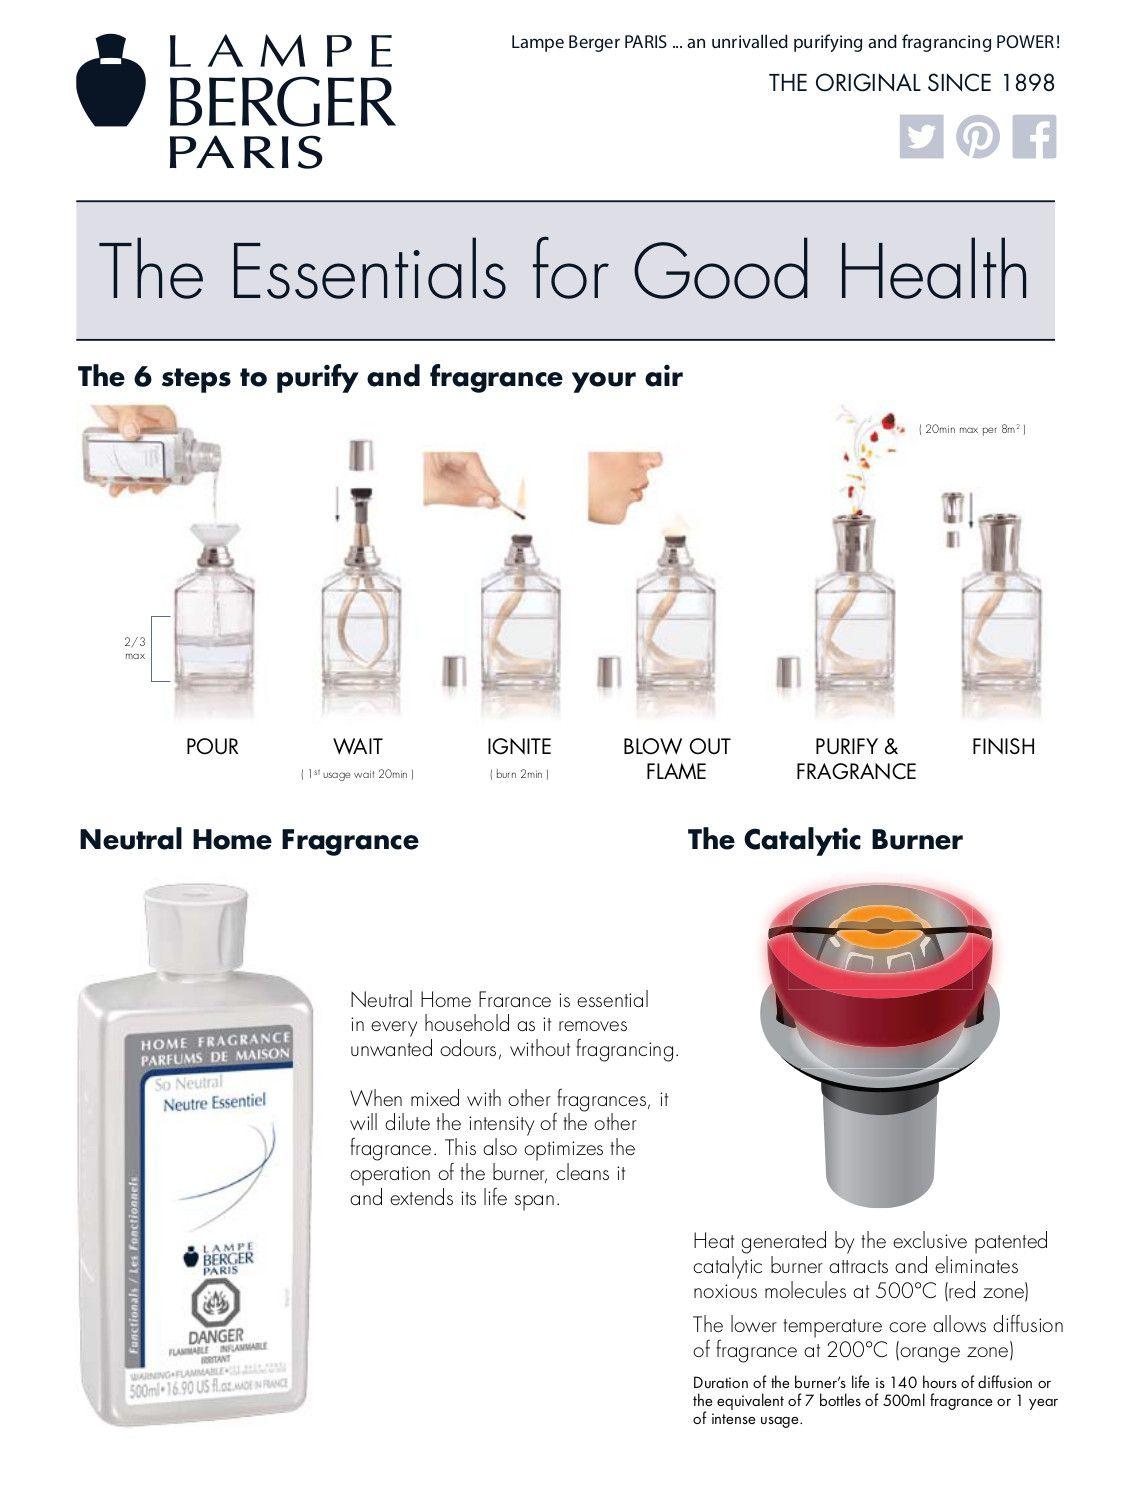 Lampe Berger Fact Sheet English 35 2 Home Fragrance Fragrance Berger